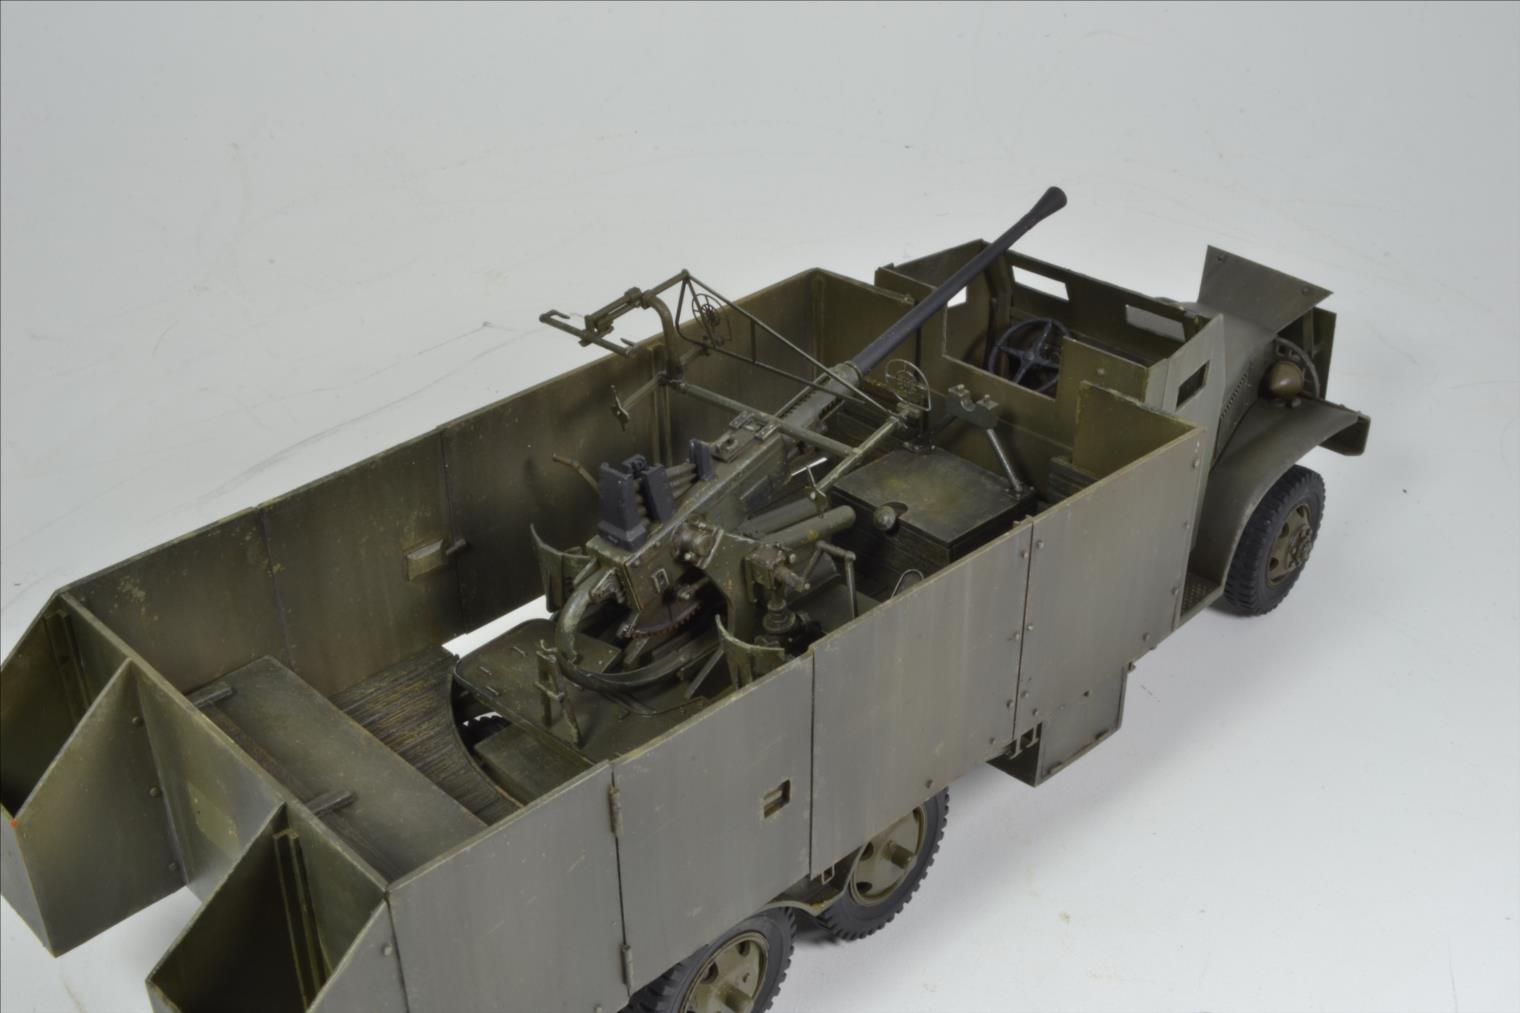 INDOCHINE GMC Bofors (Hobby Boss) 1/35 - Page 2 19122109485022494216568059